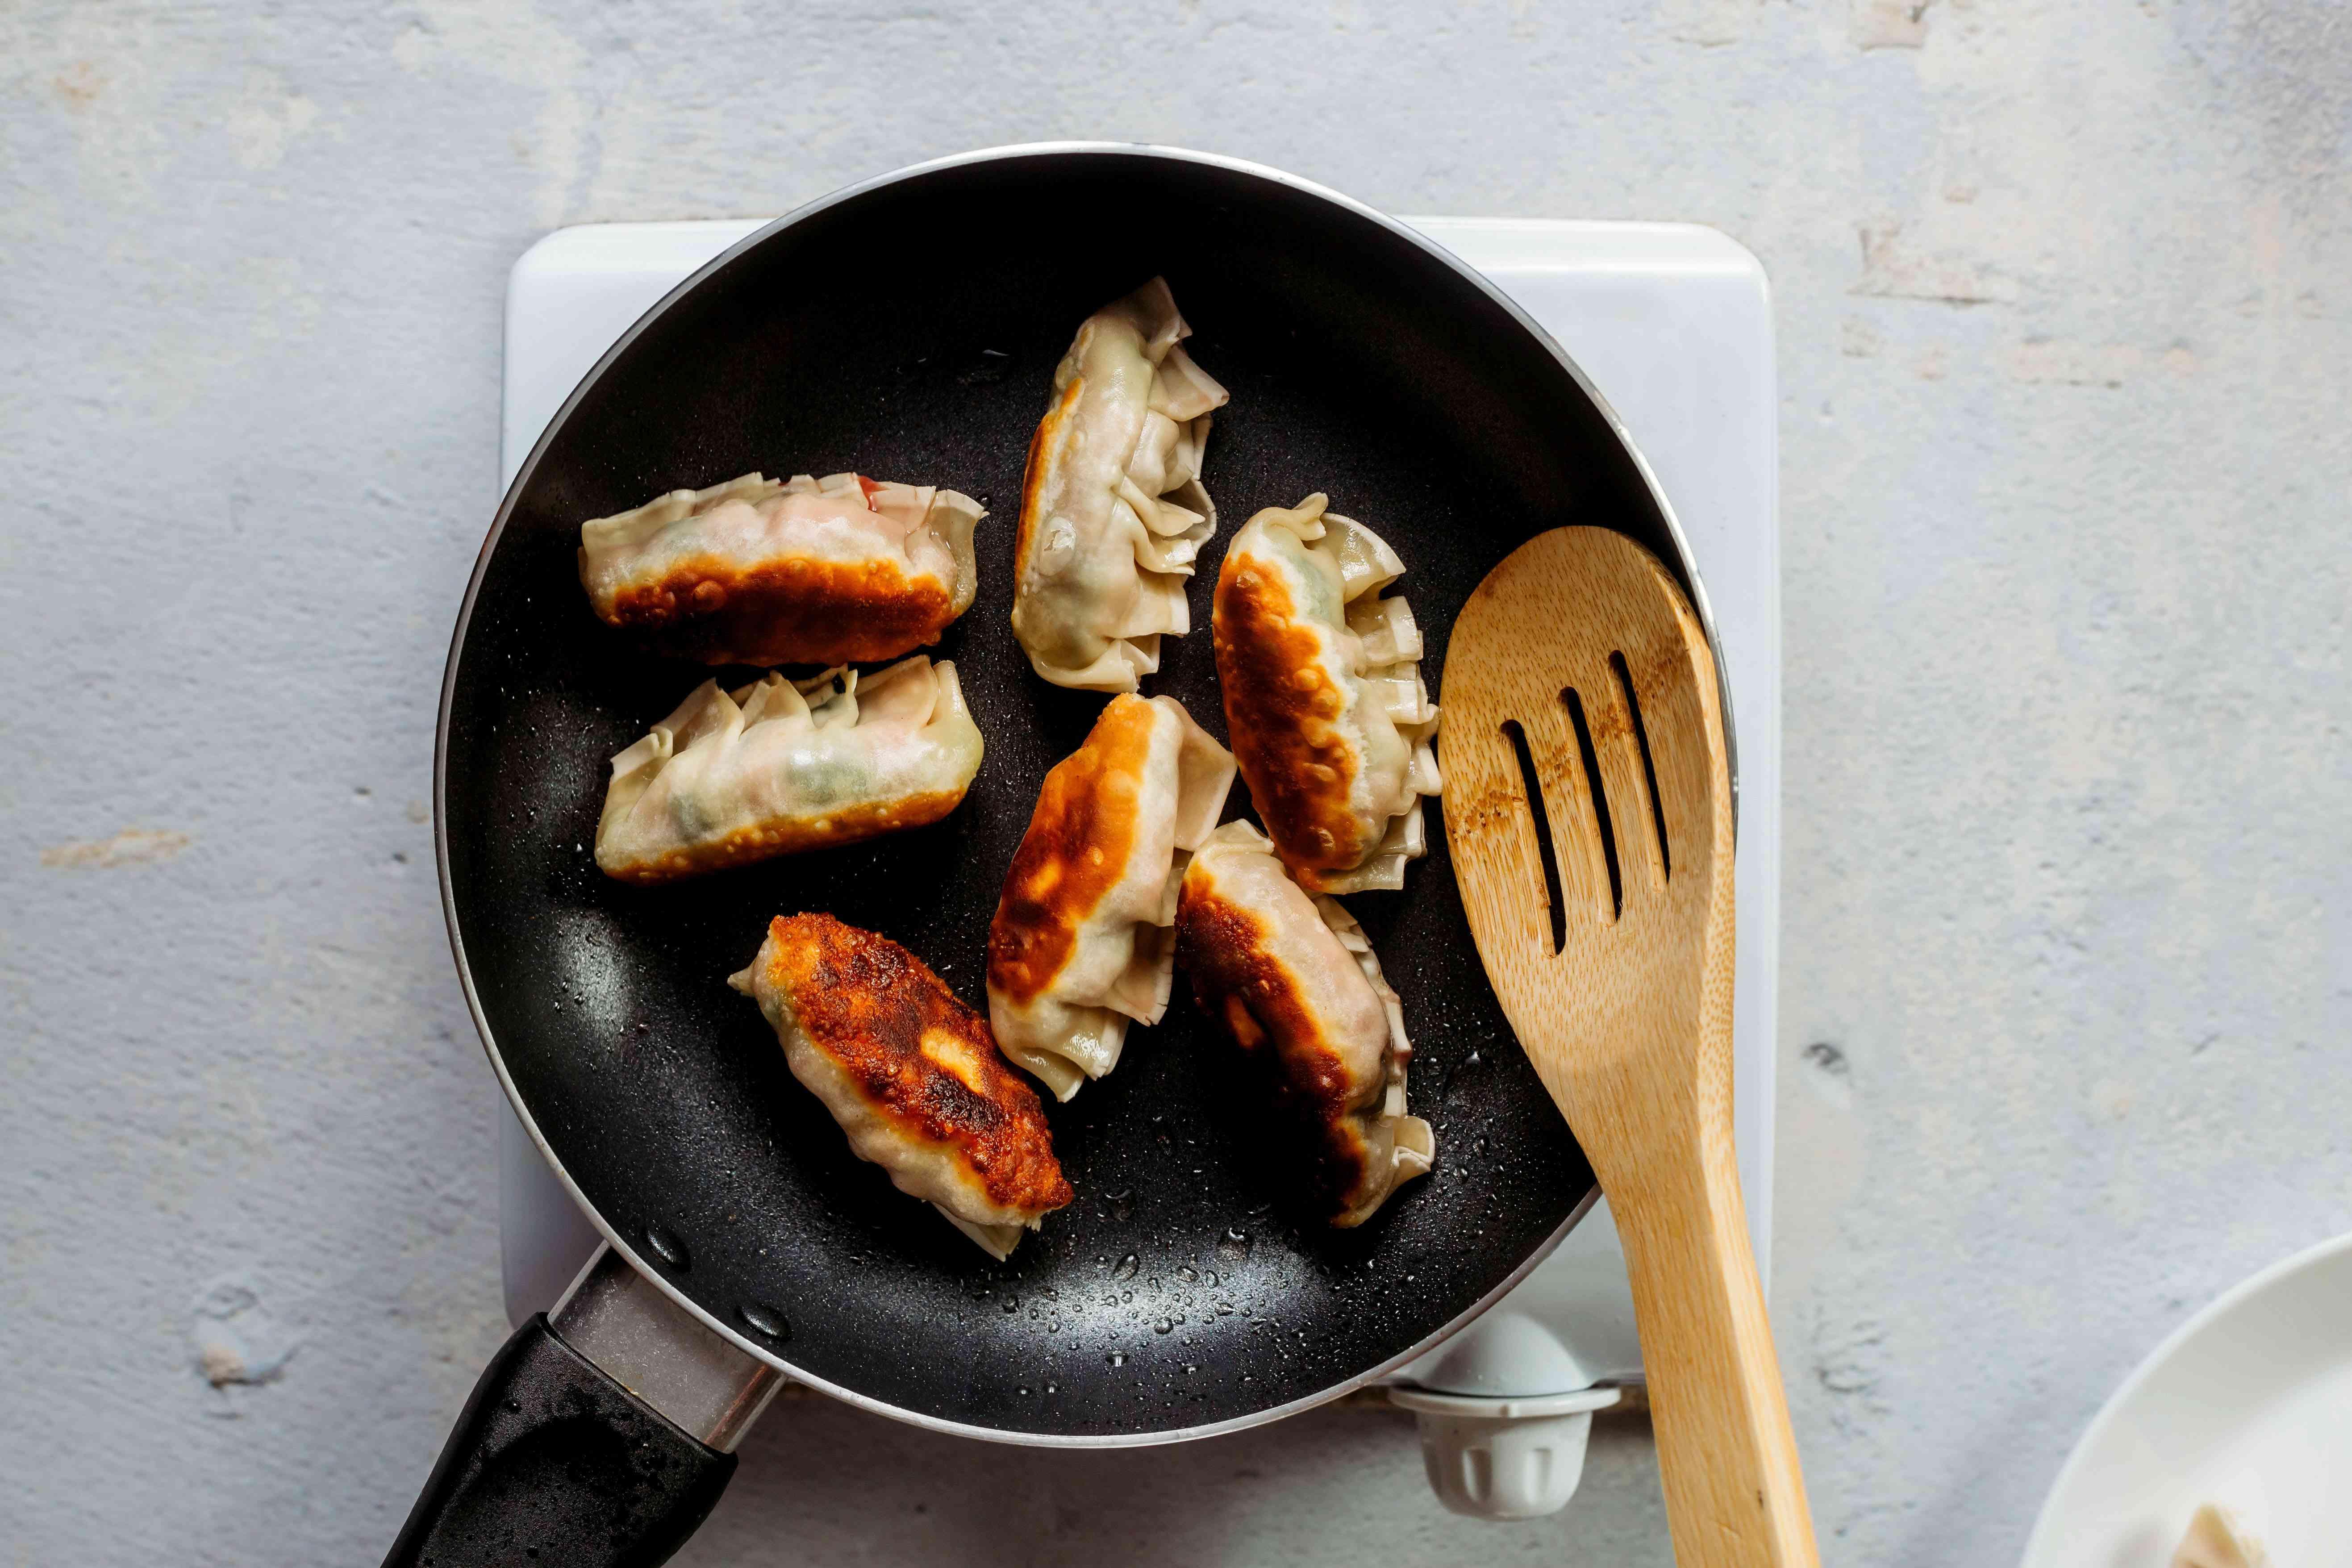 fry the dumplings in a pan